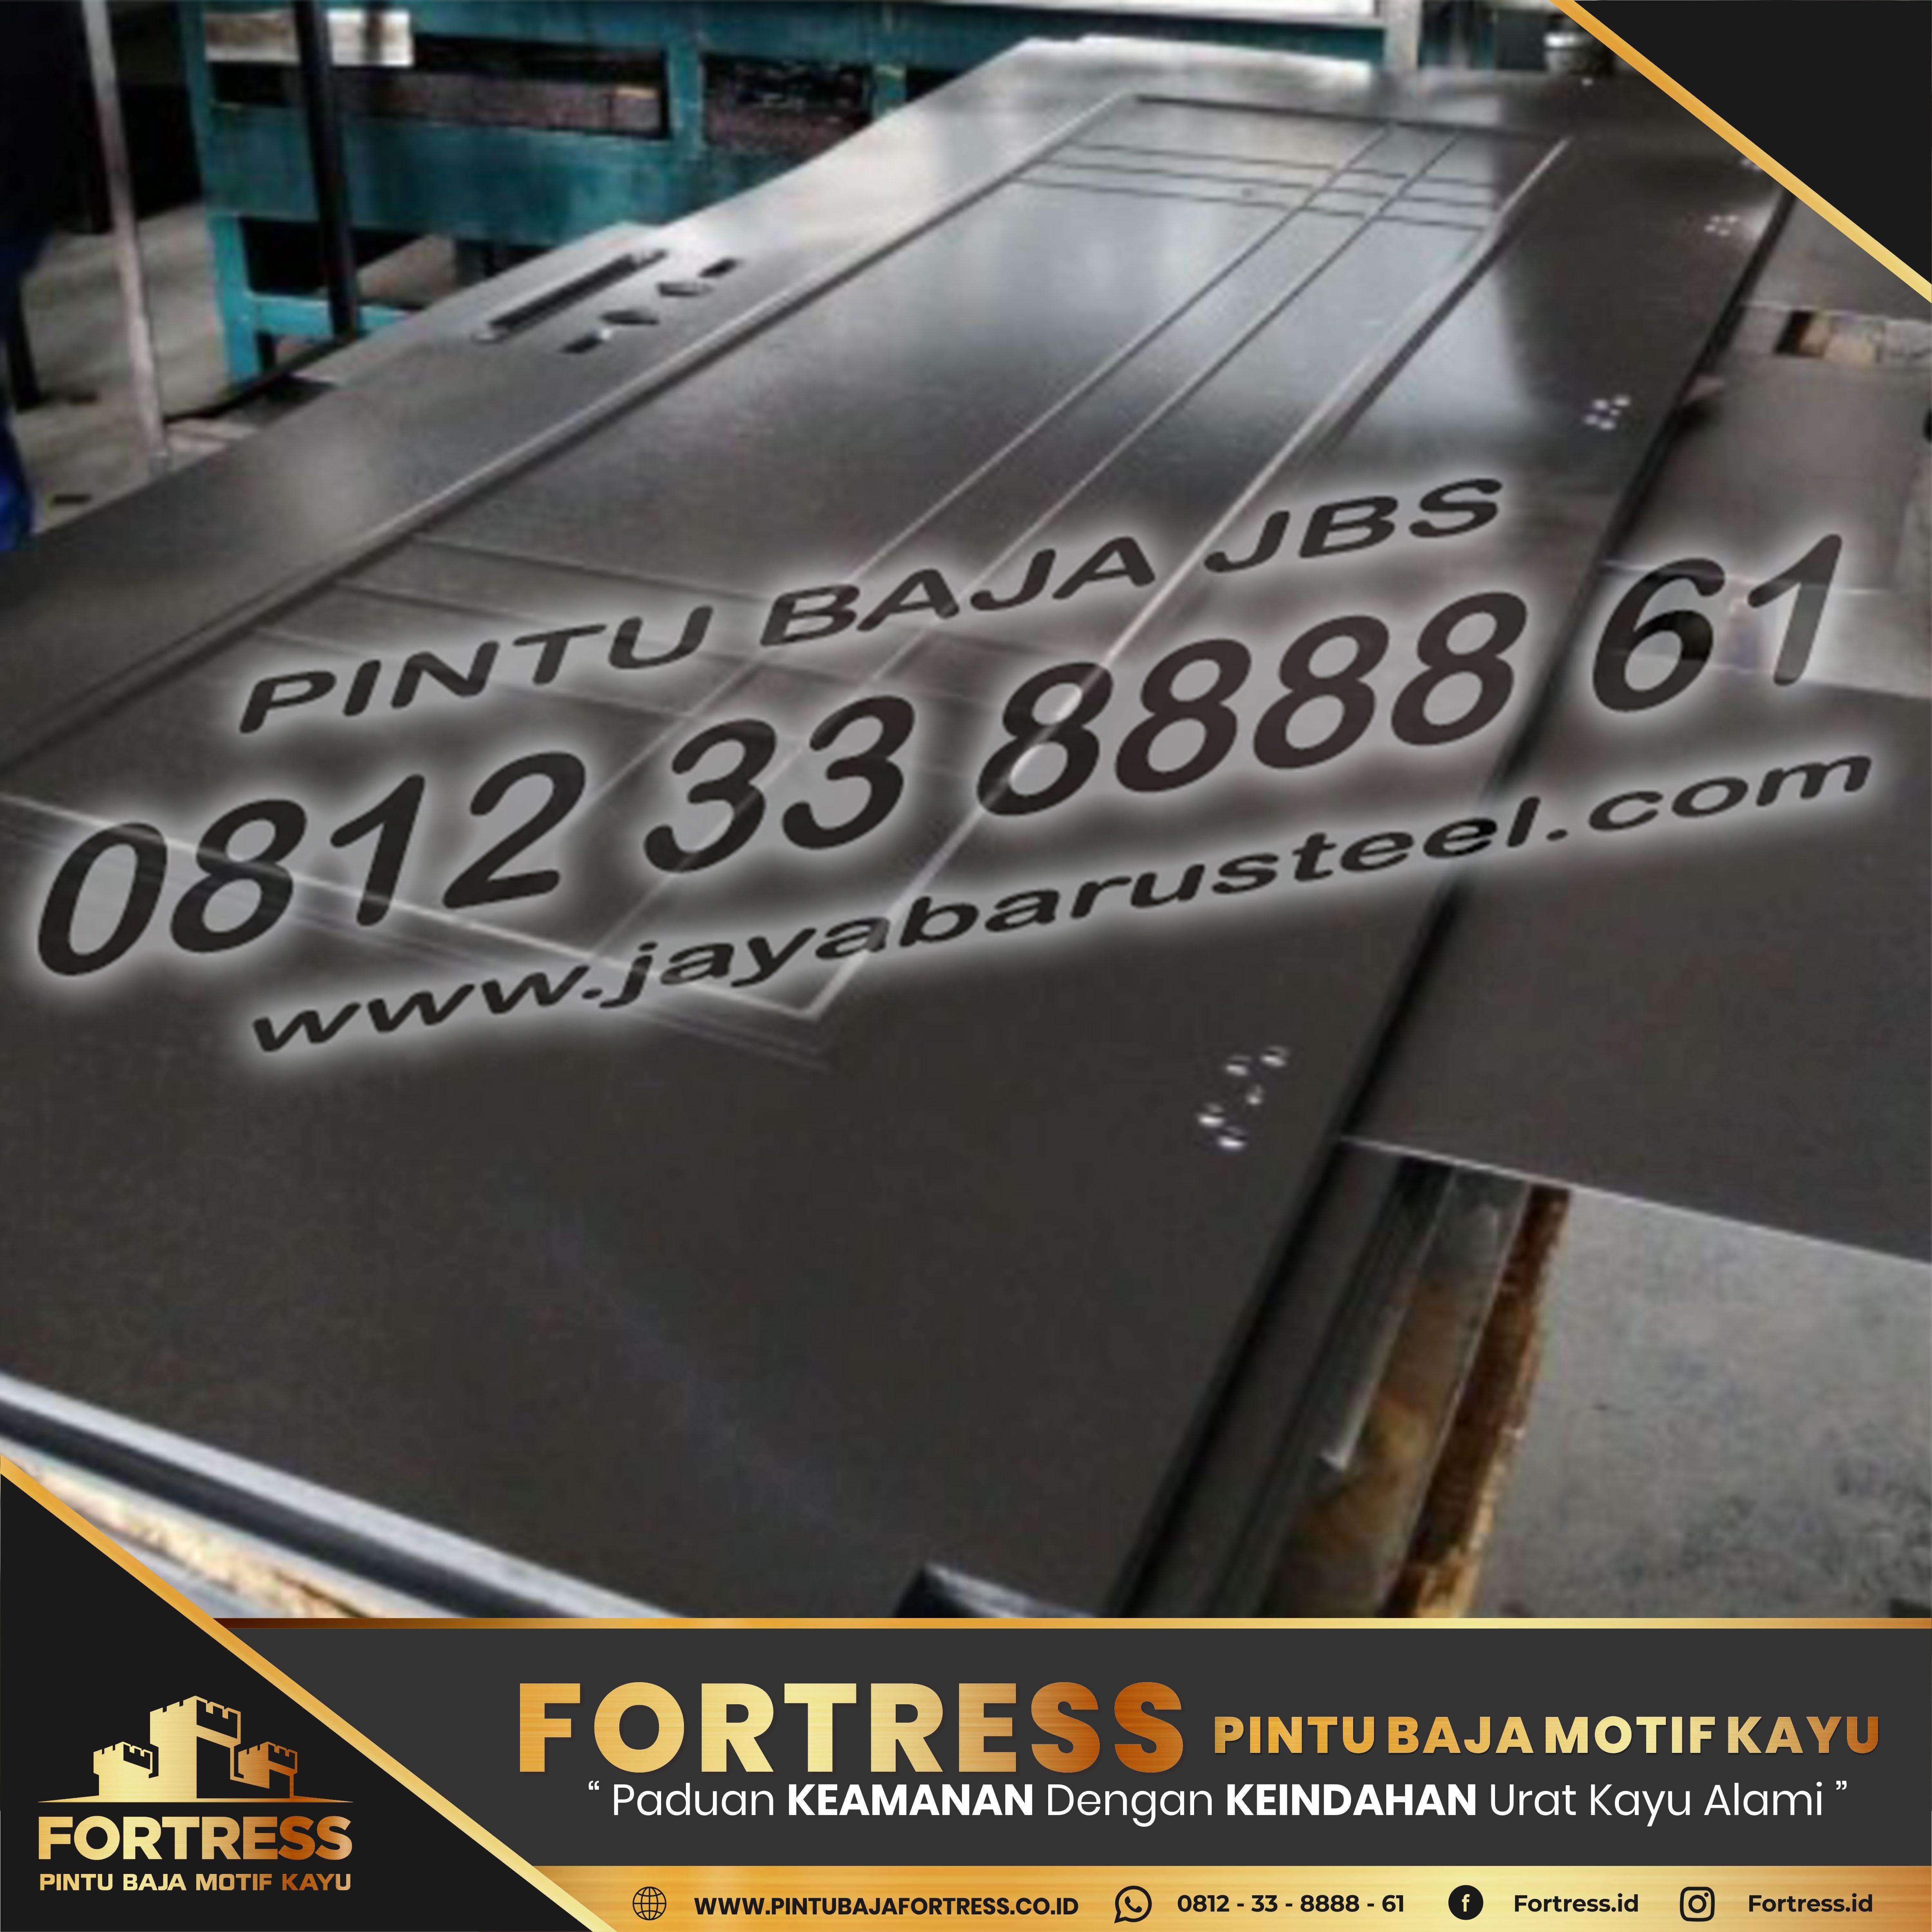 0821-91-6261-07 (FORTRESS) Steel Sliding Door Turning Board, Sp …